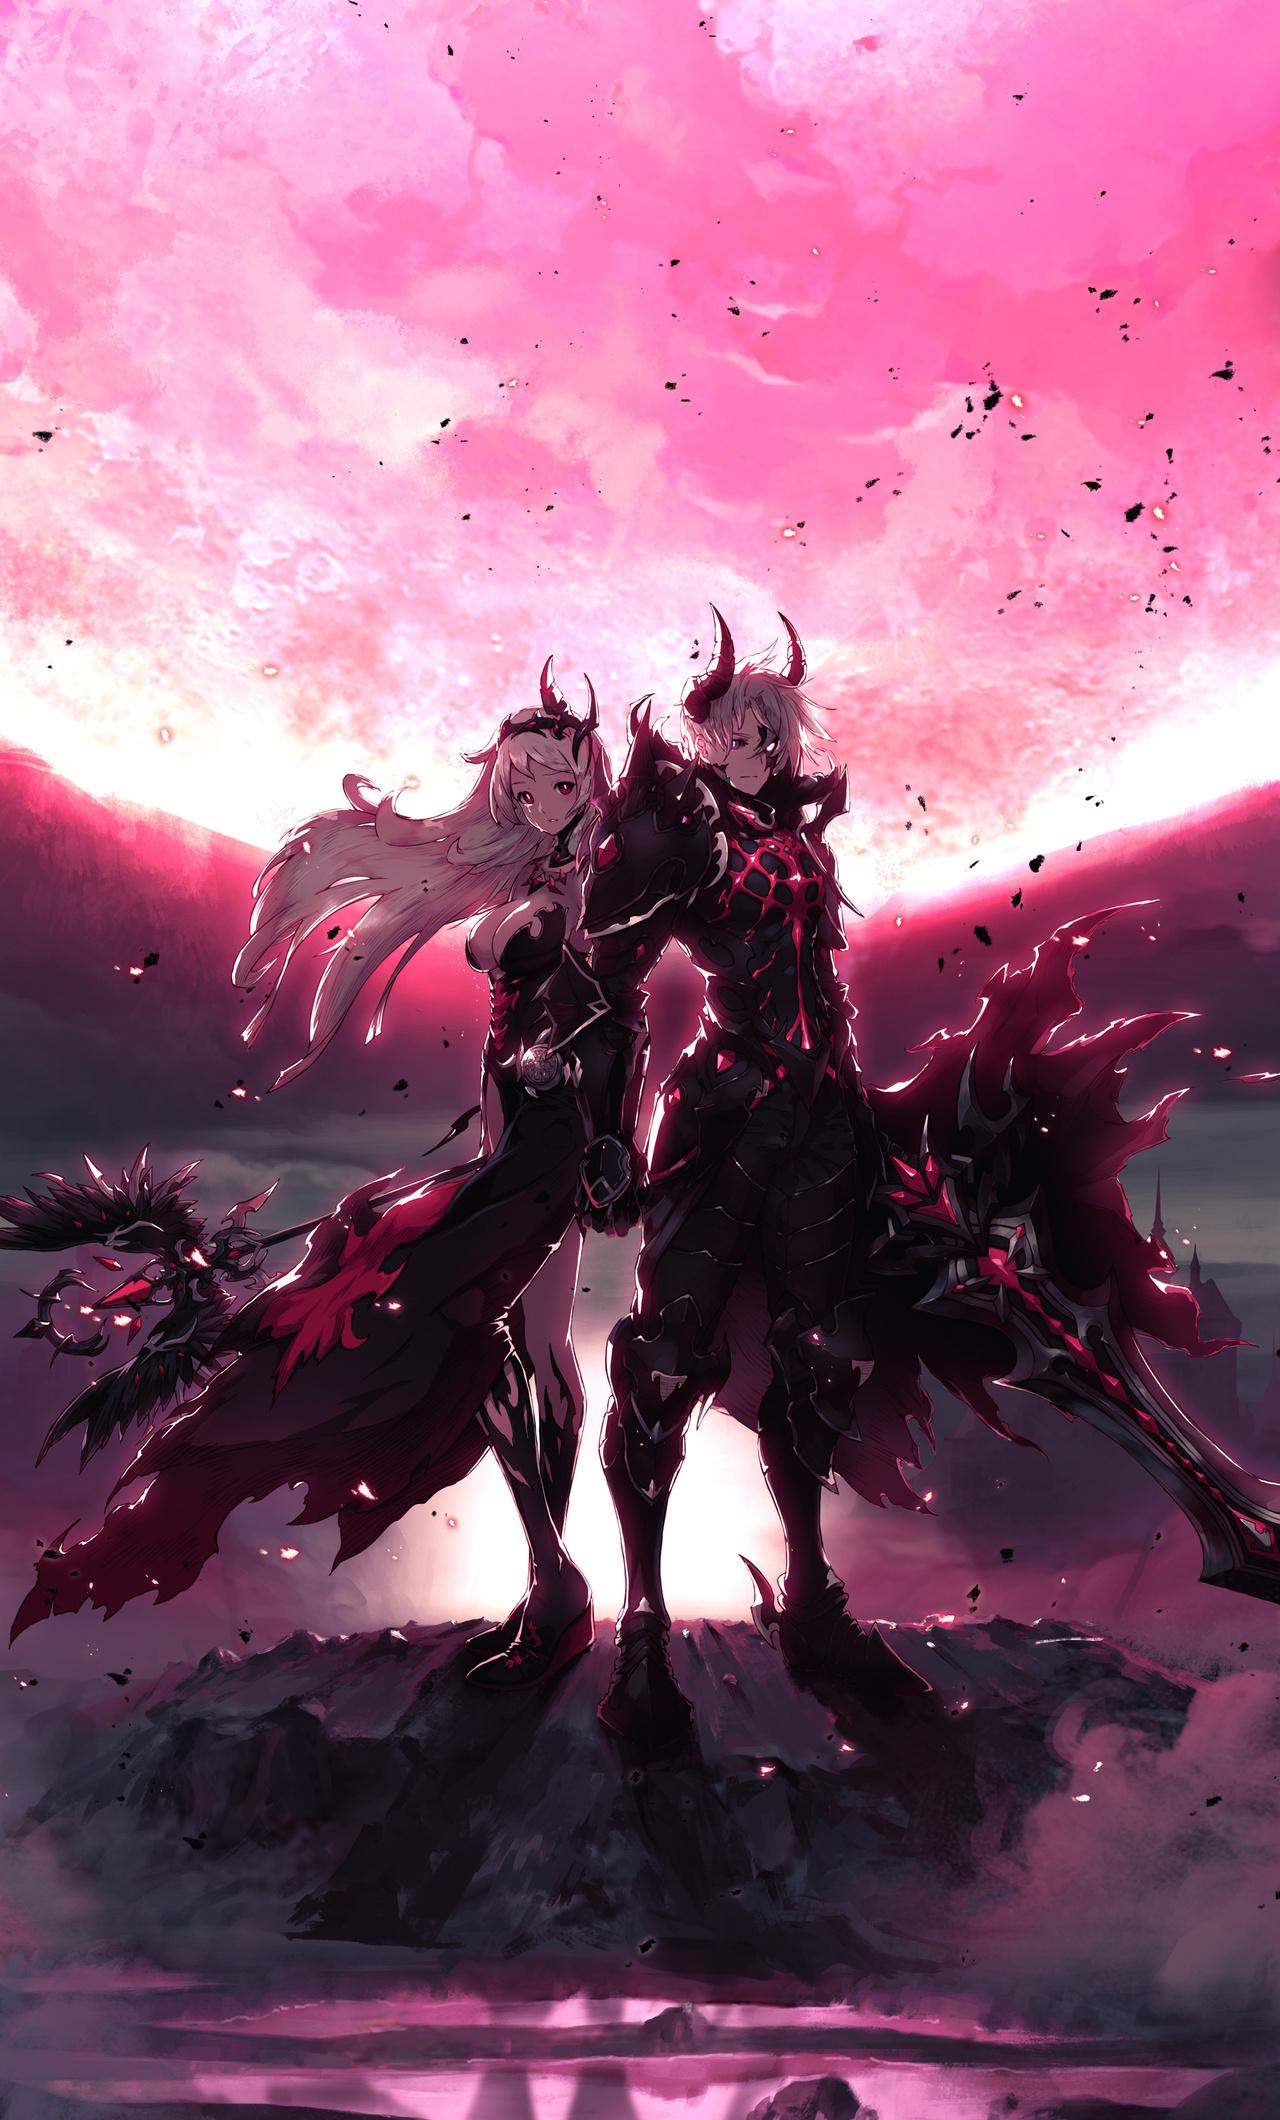 kings-raid-pandemoniumx-8k-2m.jpg